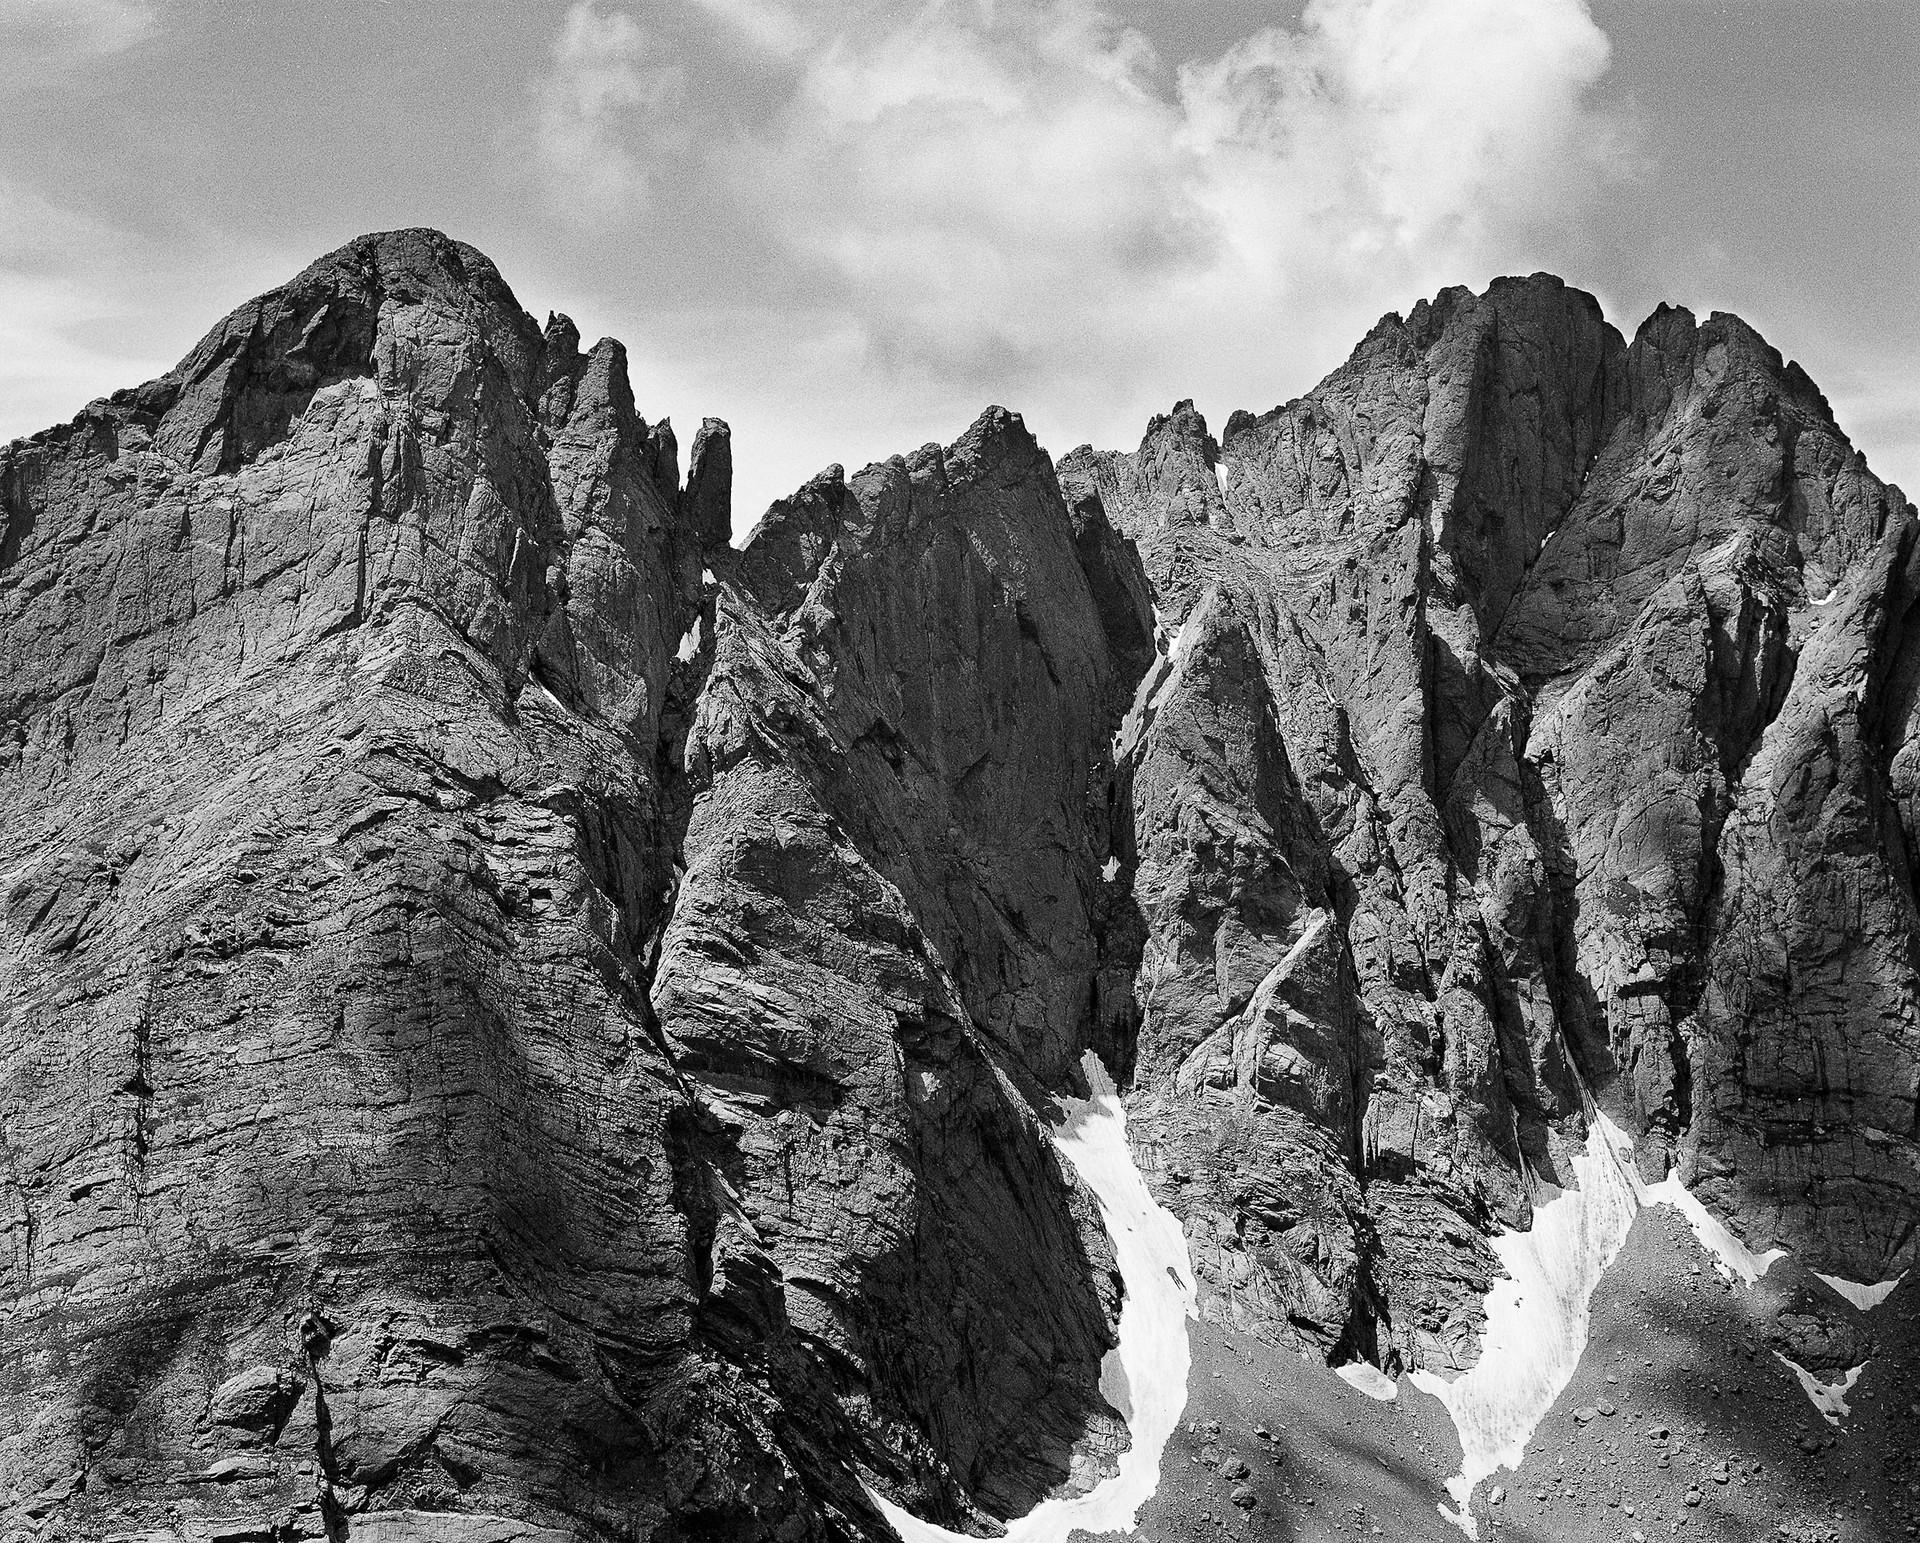 Crestones from Humboldt Peak